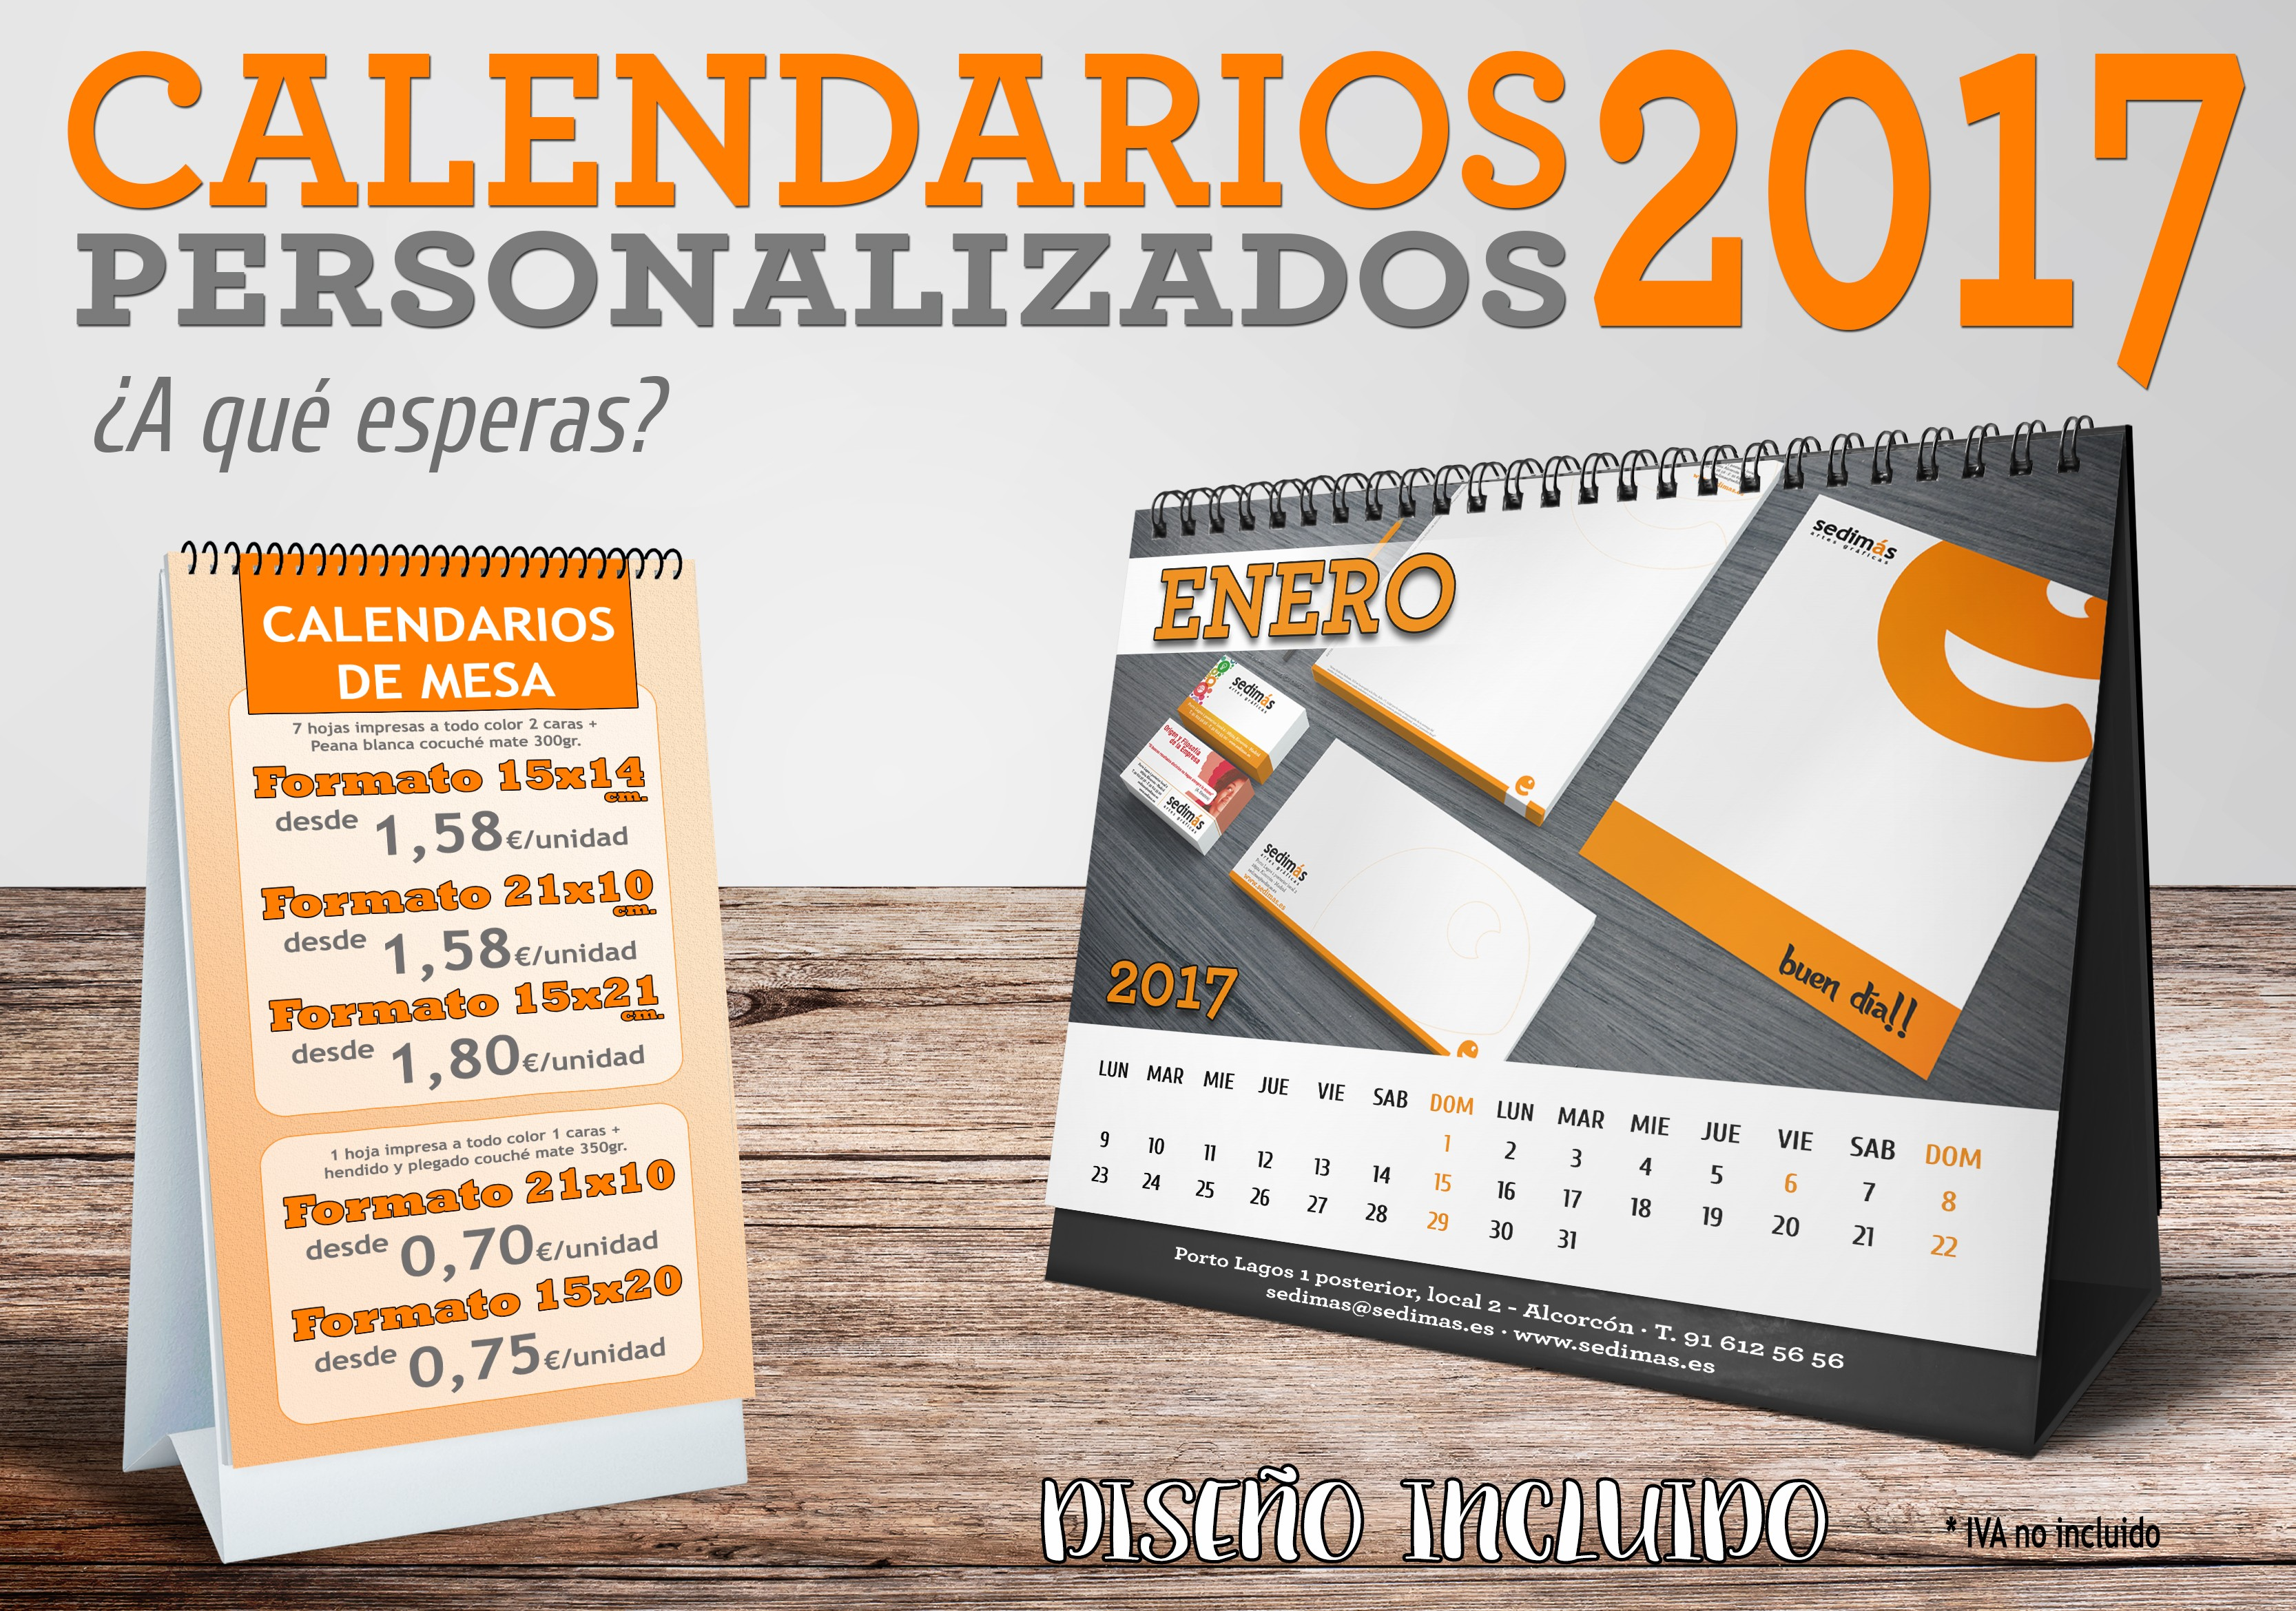 Calendario Imprimir Diciembre 2017 Recientes formato De Calendarios Yelomdiffusion